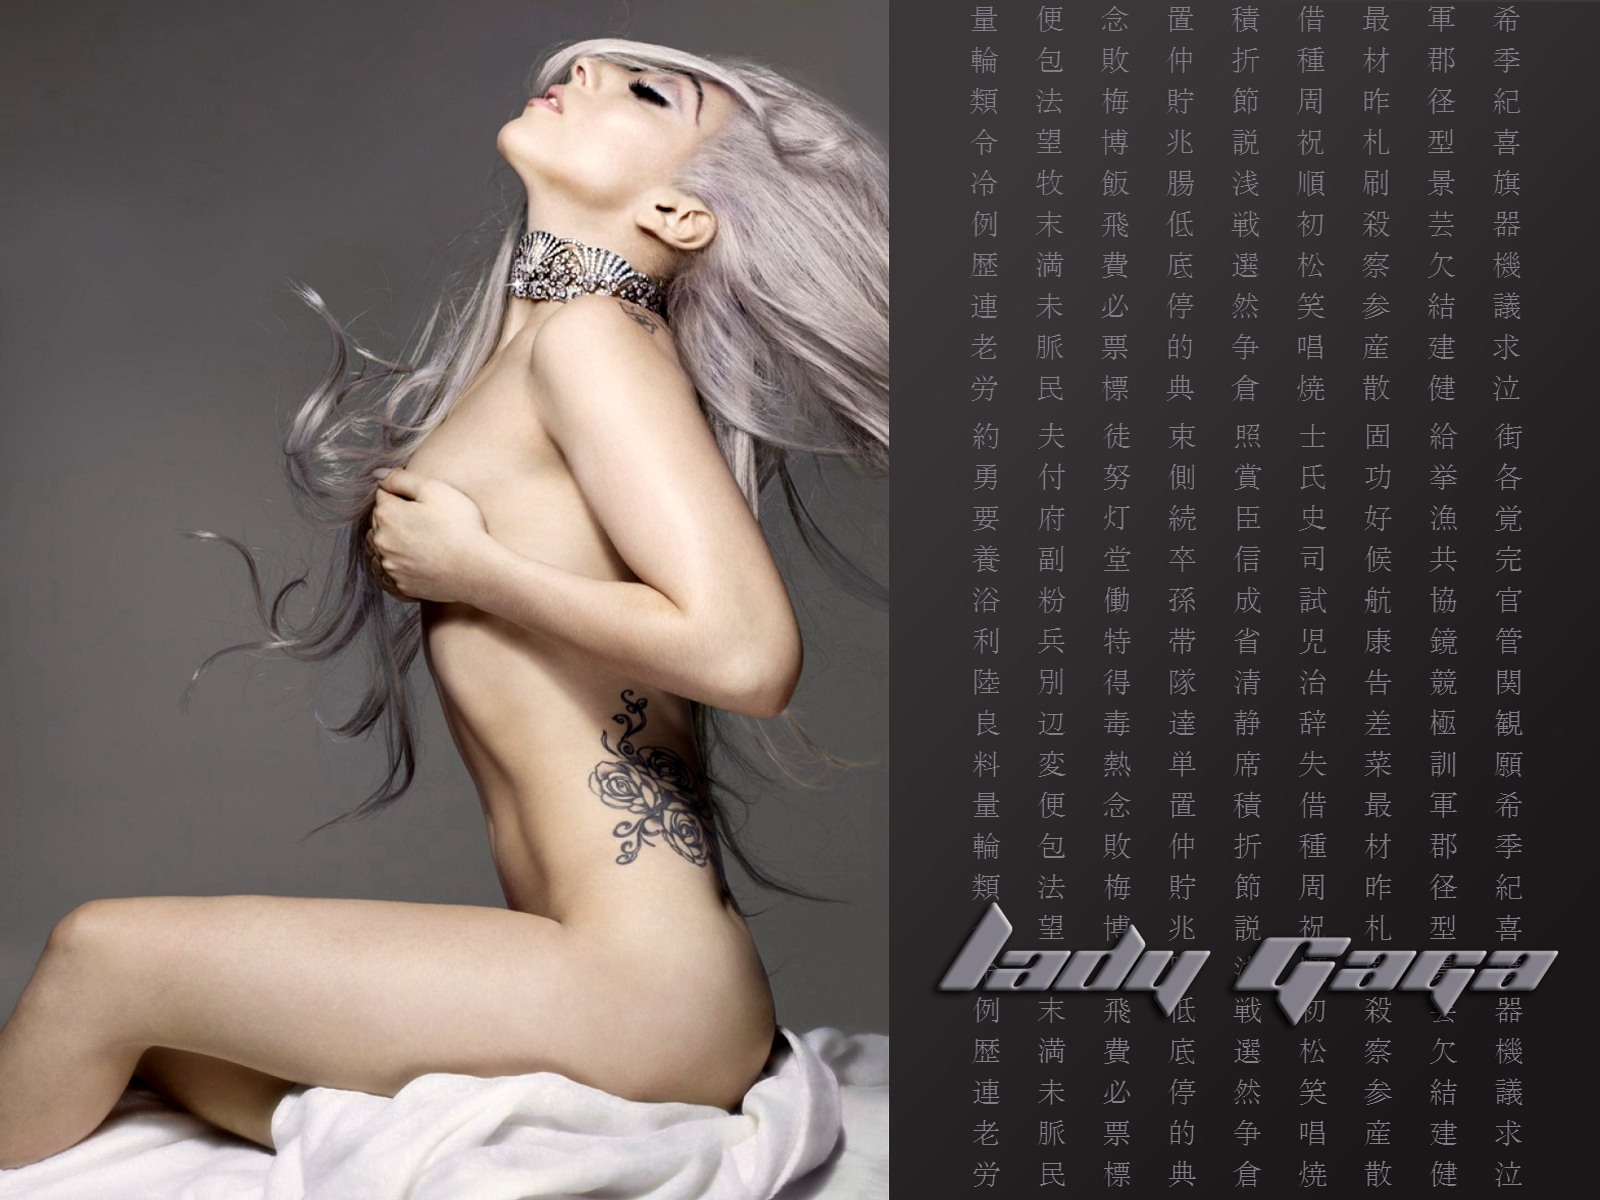 http://2.bp.blogspot.com/-kITswADBX1c/TtOY30HxtMI/AAAAAAAAFLg/ZFlMJLE_tbQ/s1600/sploogeblog_lady_gaga_naked_topless_castsuit_wallpaper_03.jpg